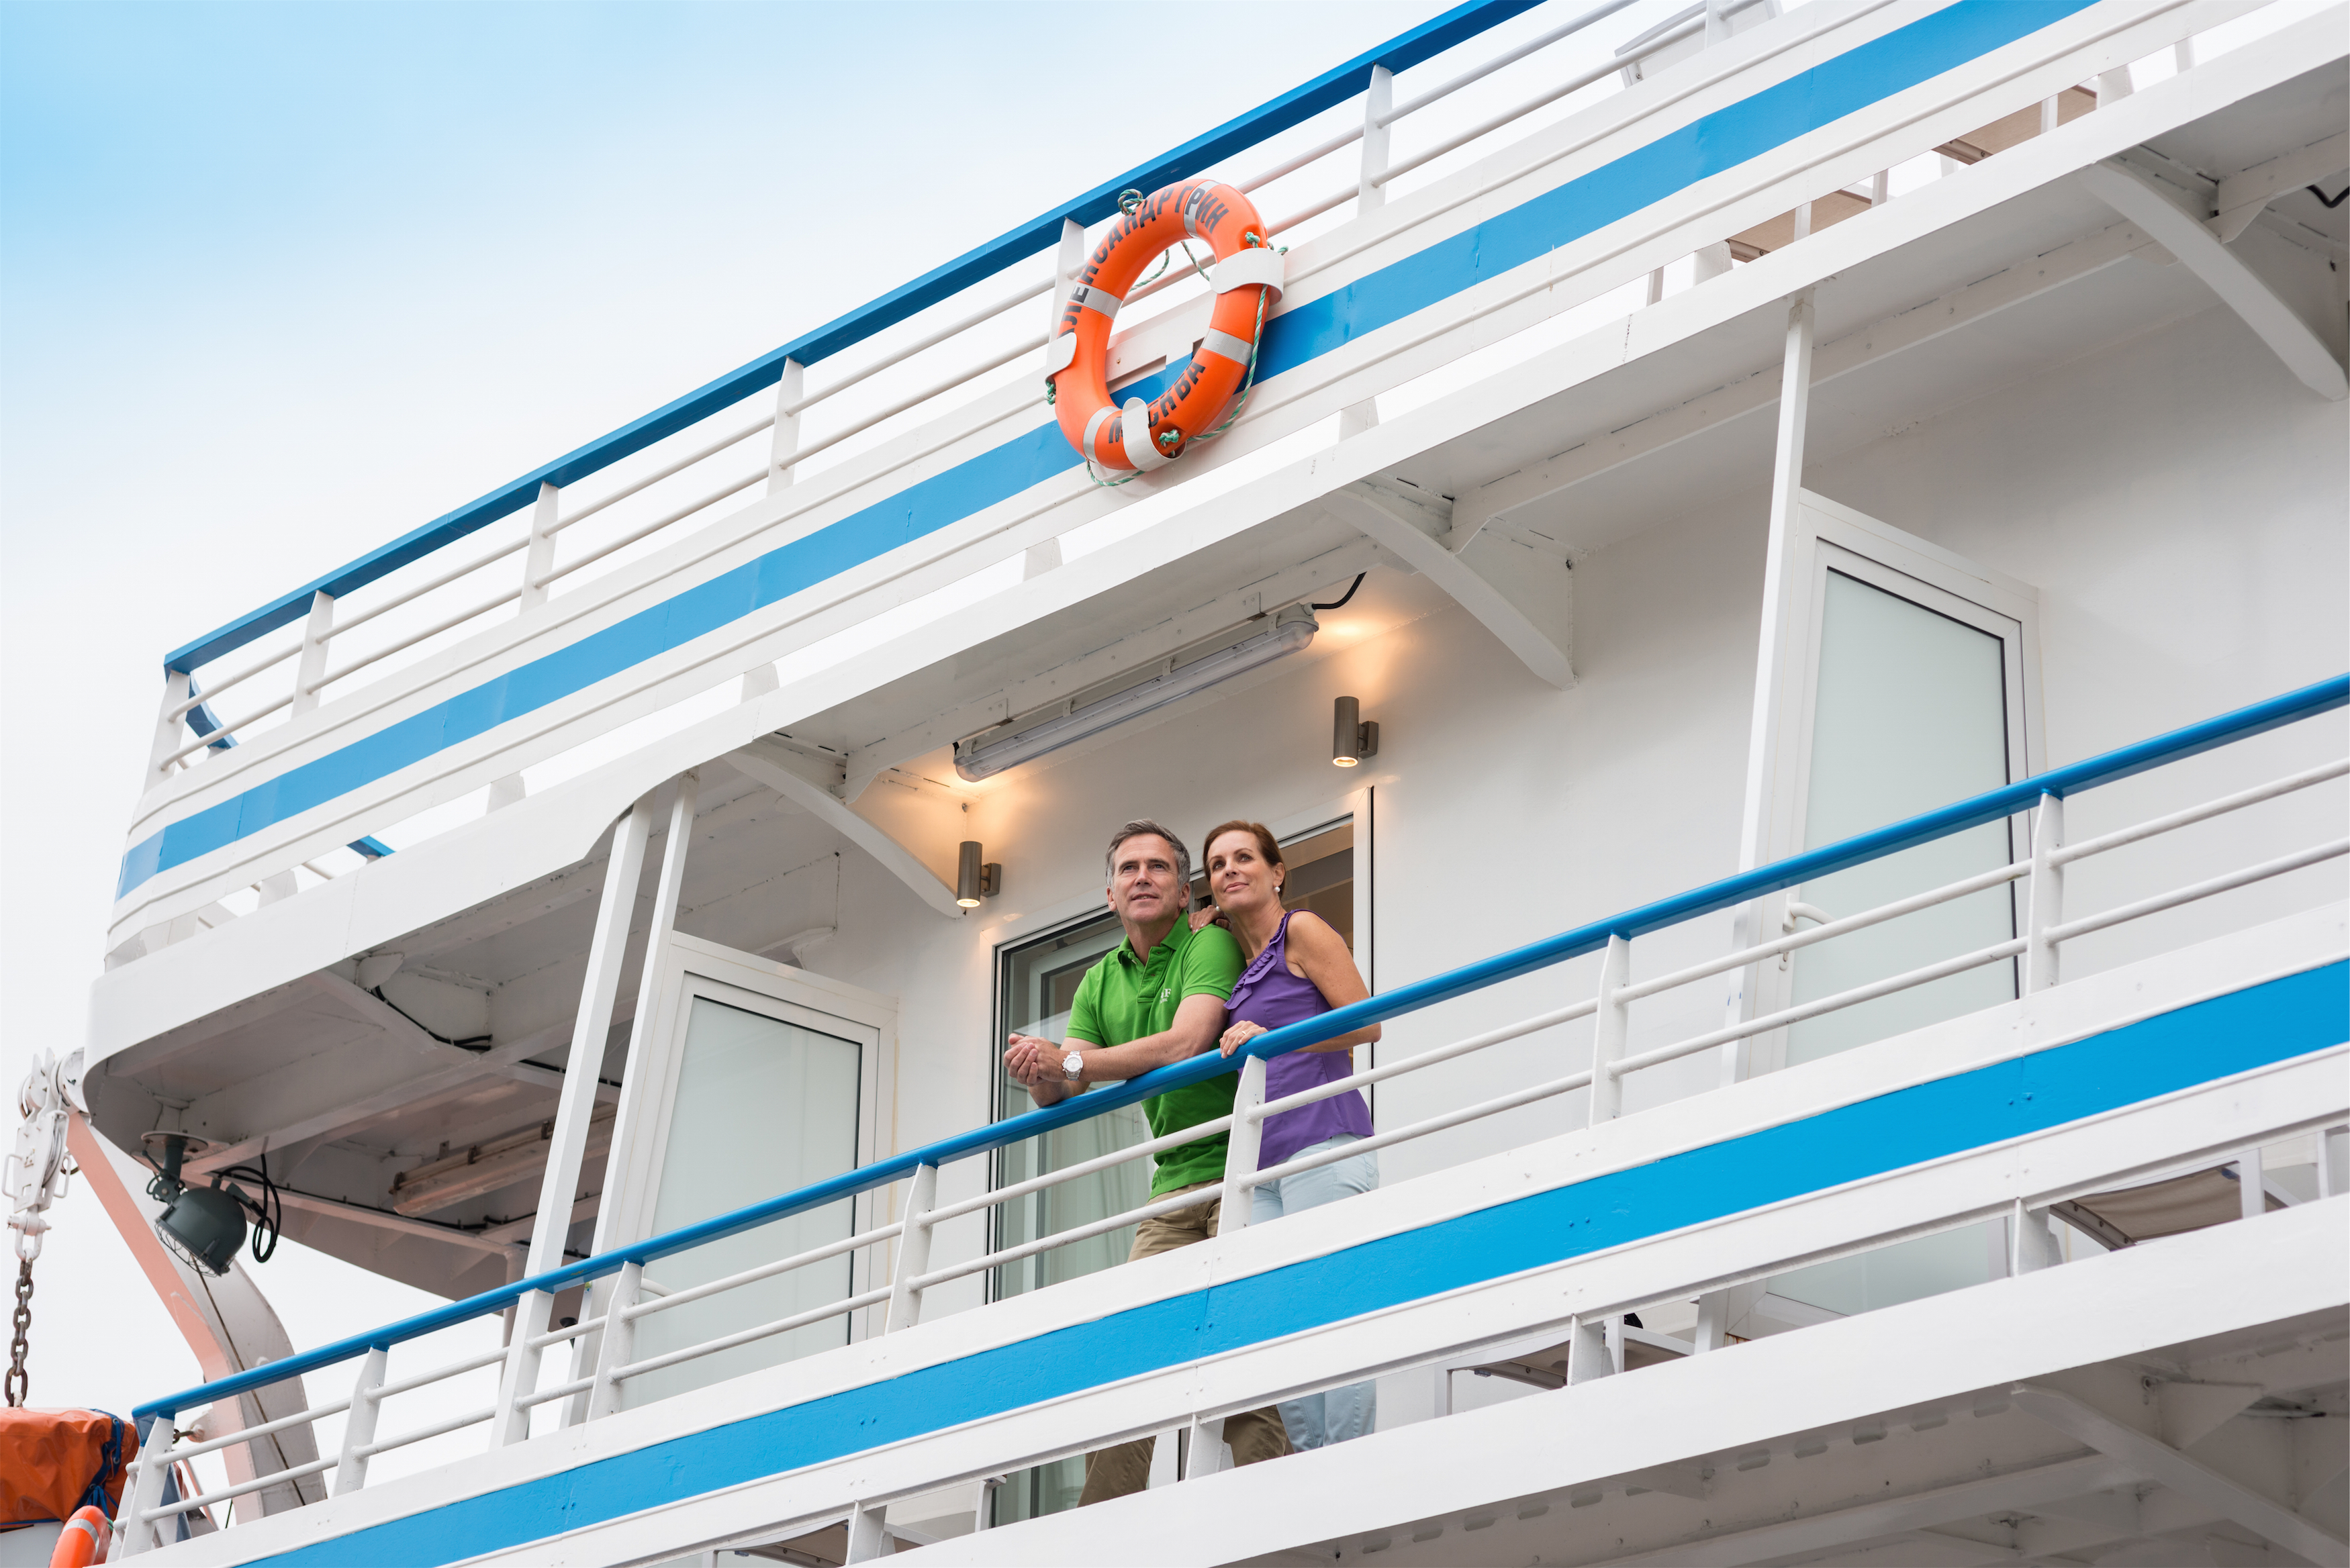 Scenic Tsar Accommodation Deluxe Balcony Suite 2.jpg